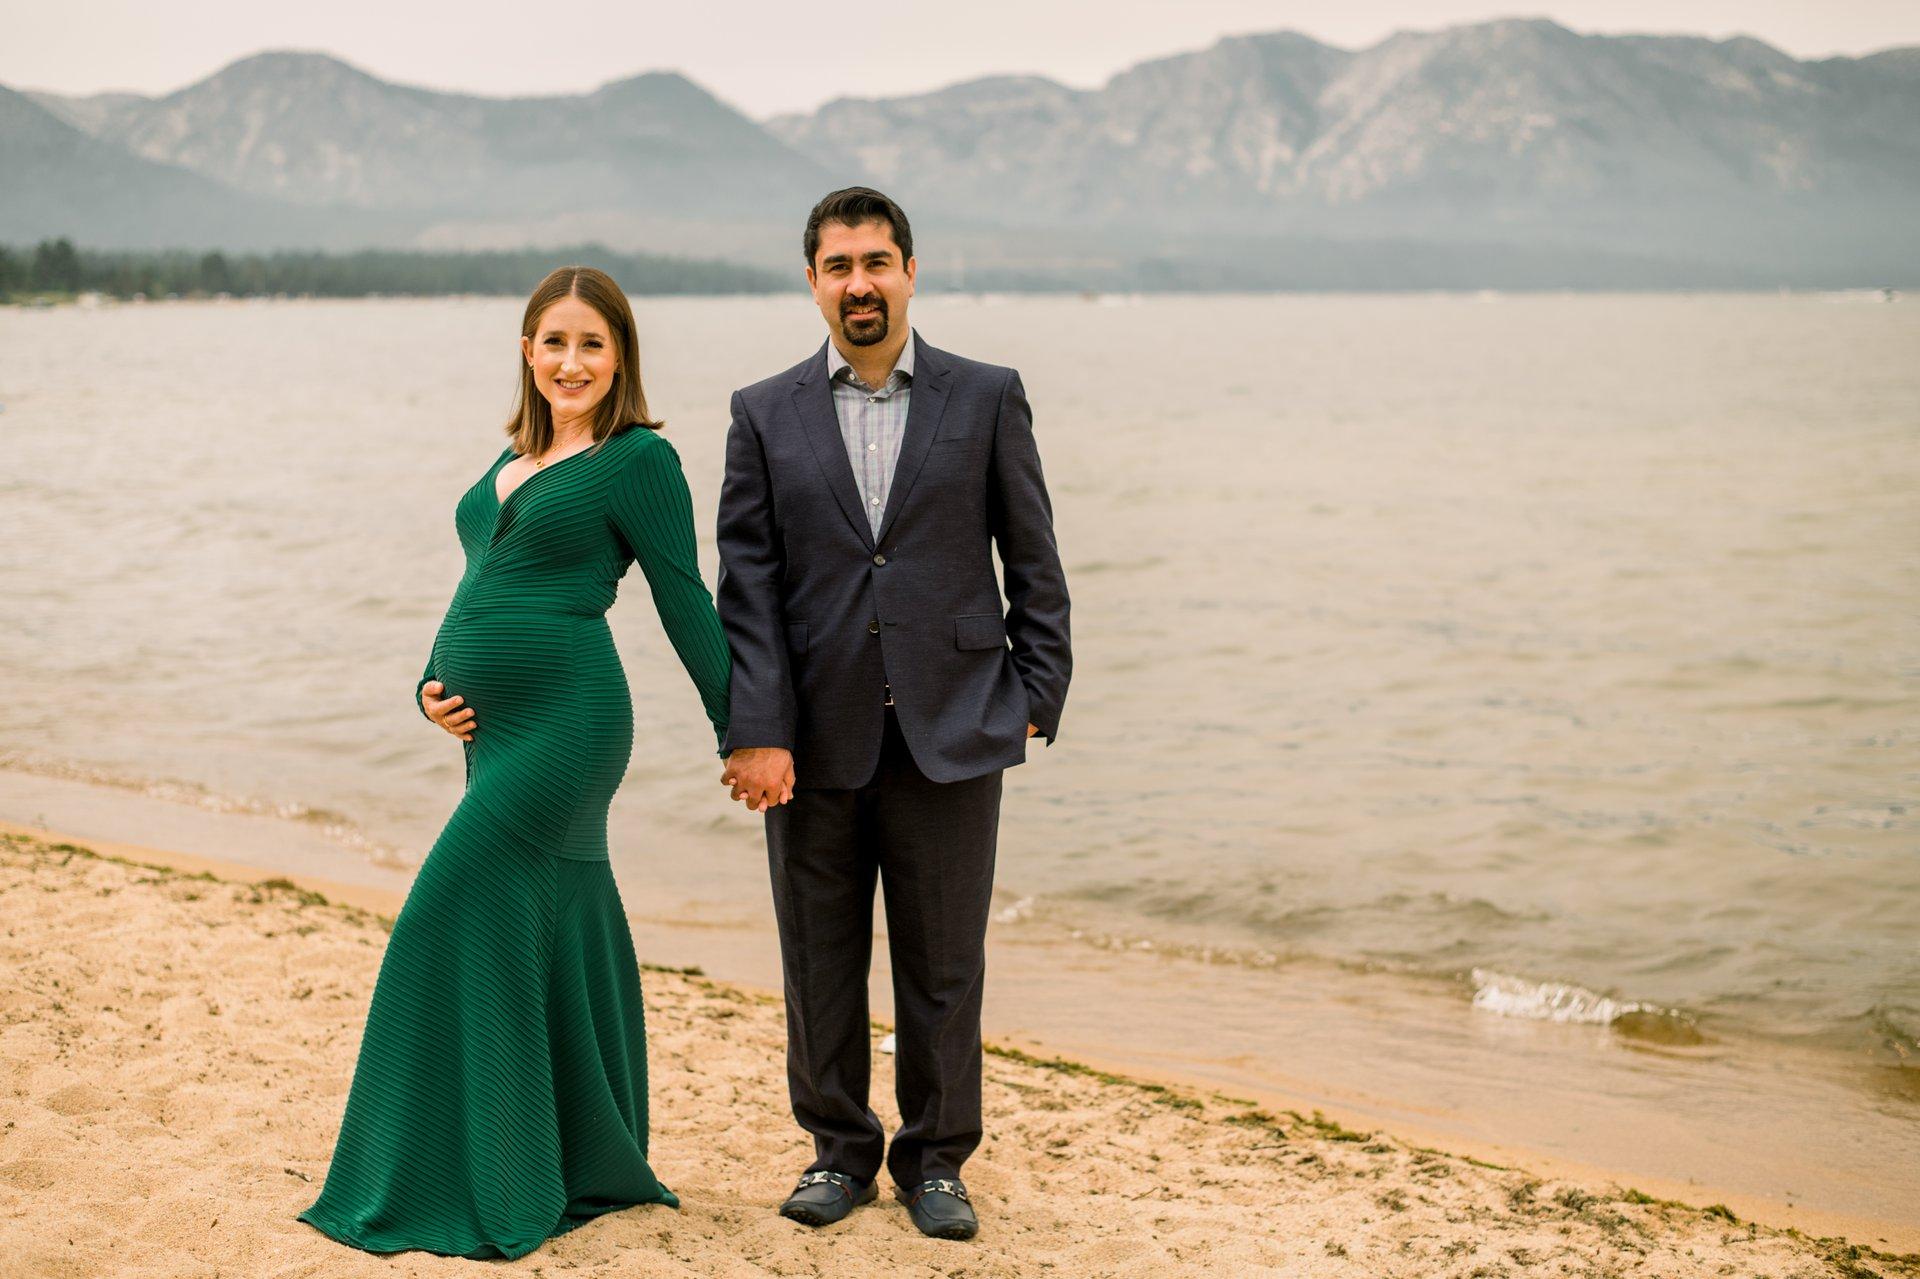 Flytographer Travel Story - Lake Tahoe Babymoon